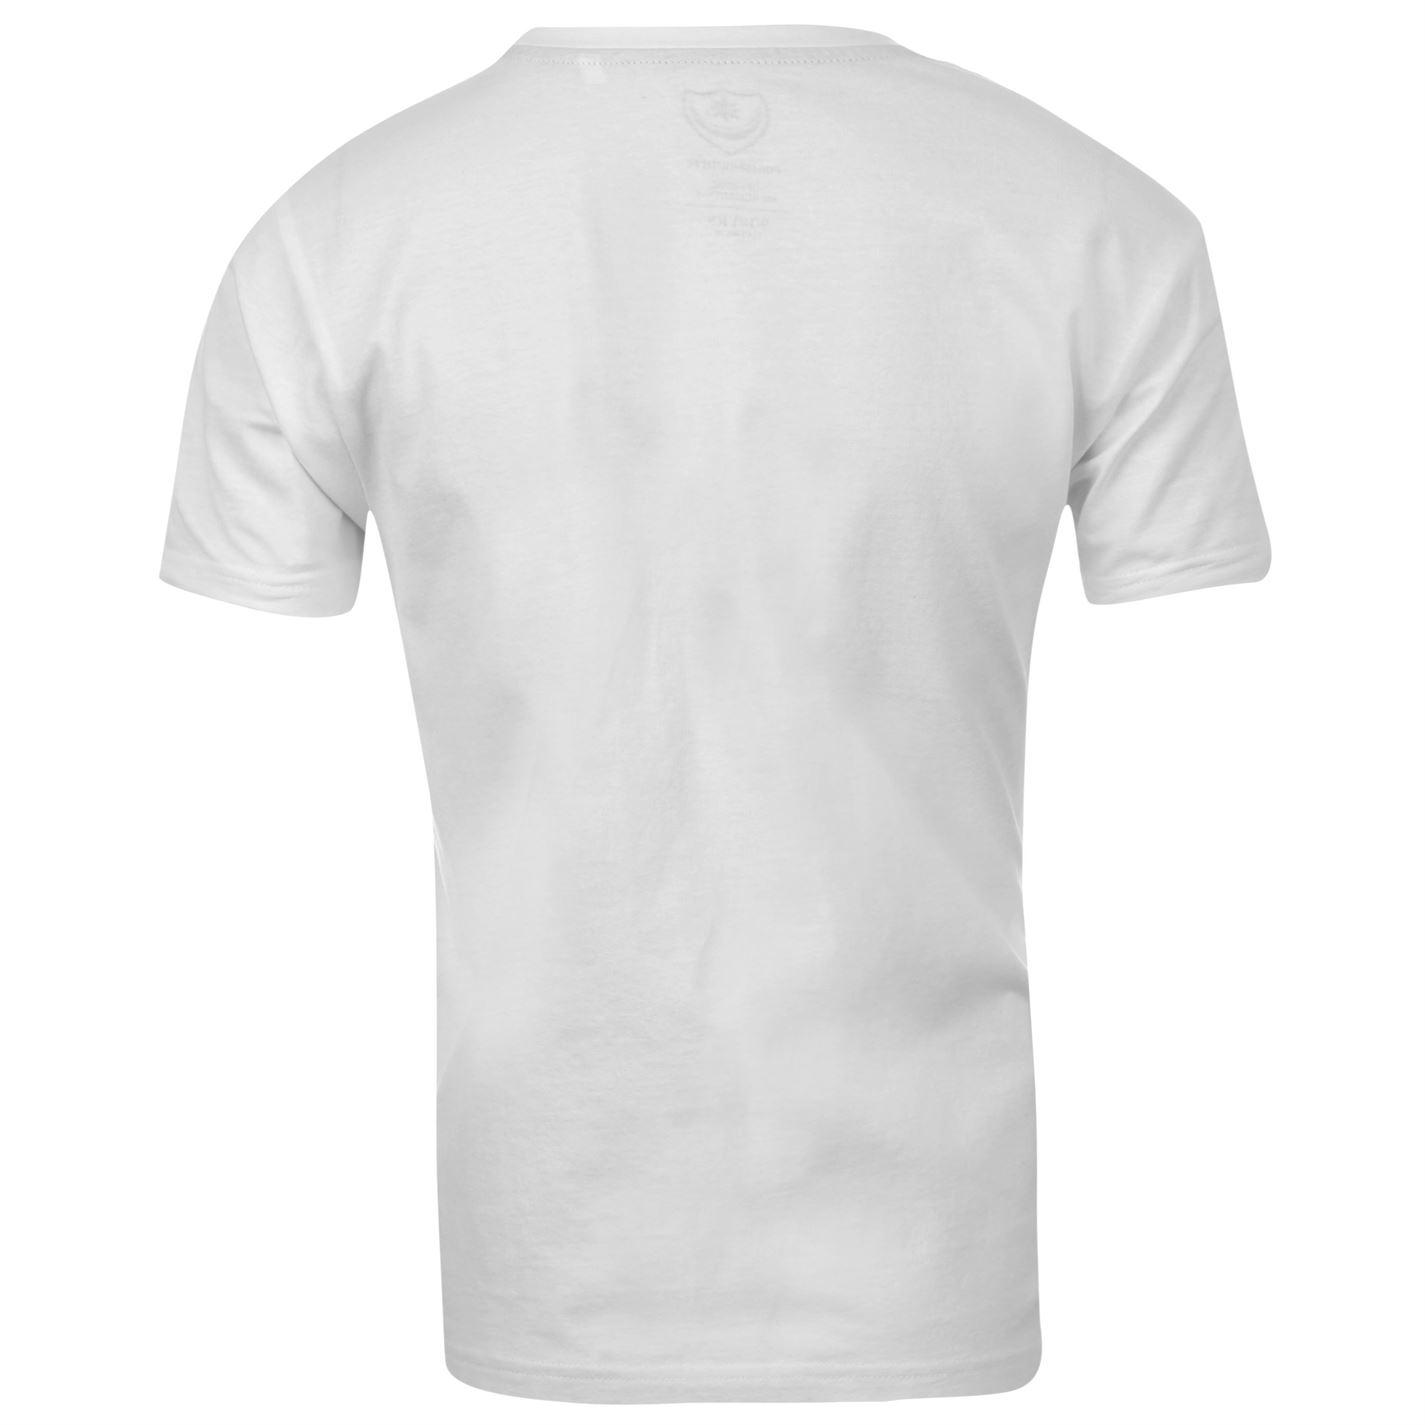 Team Kids Crew T Shirt Infants Boys Short Sleeve Tee Top Cotton